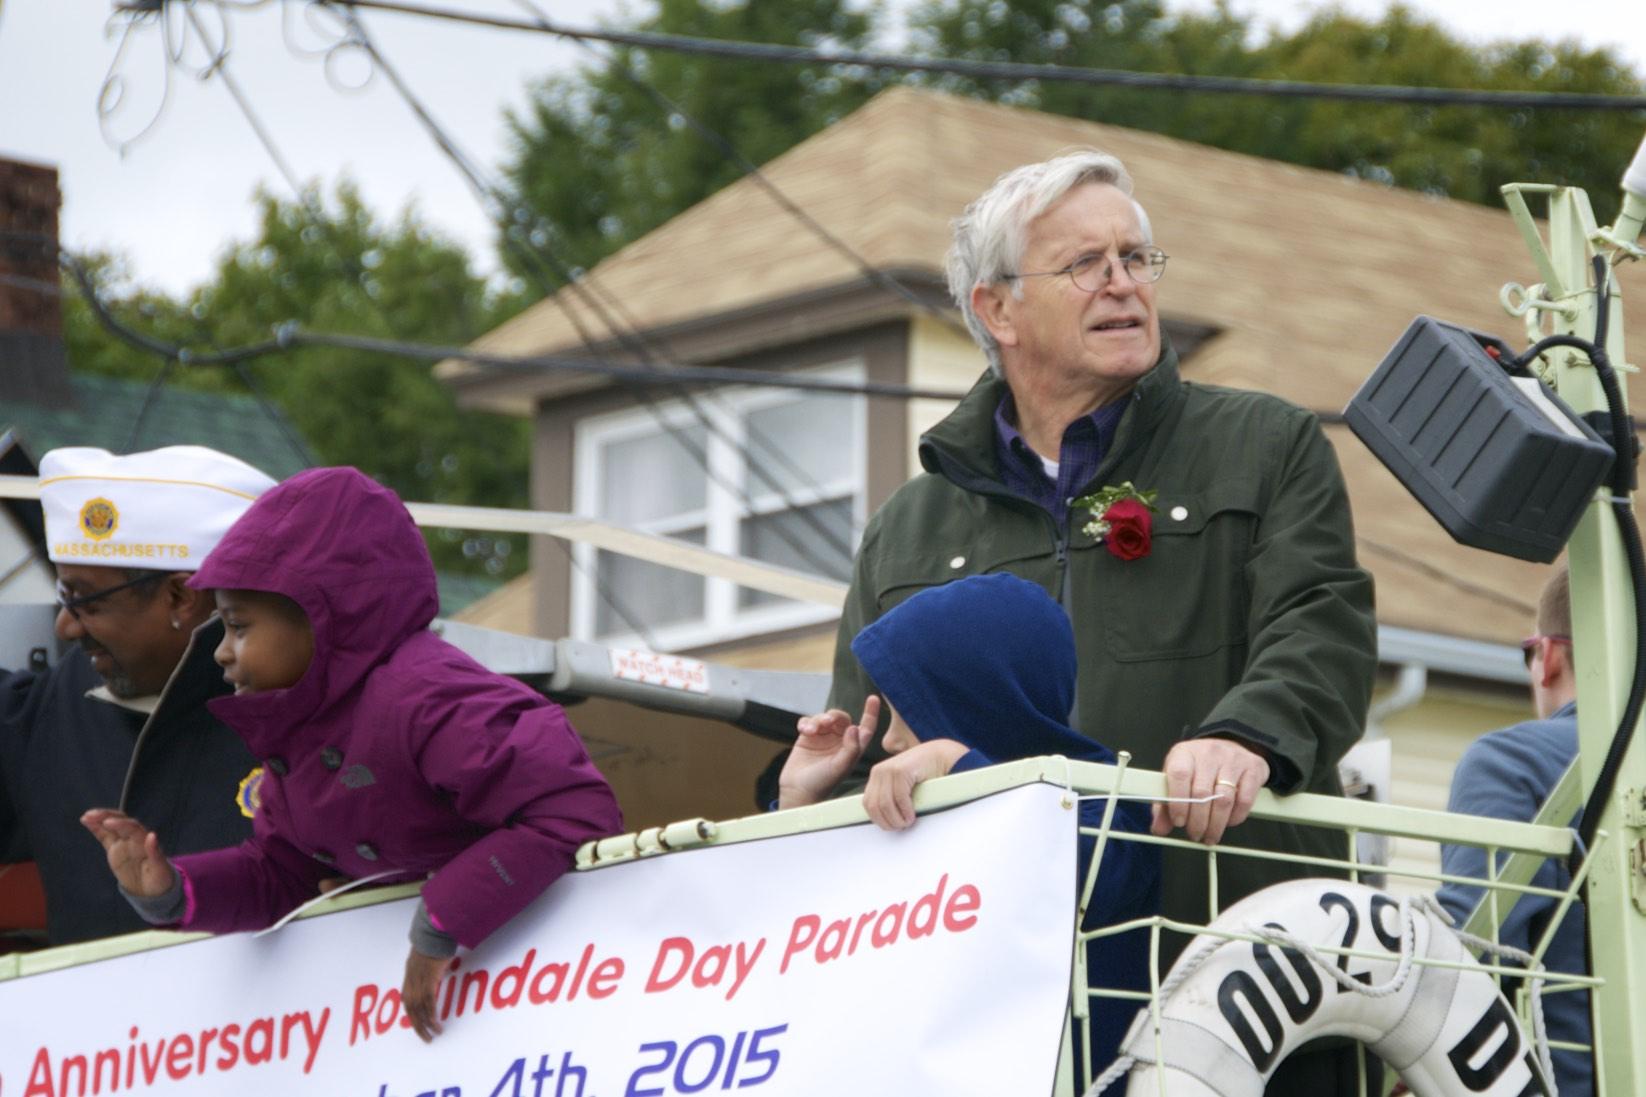 Roslindale_Day_Parade_2015_27.jpg